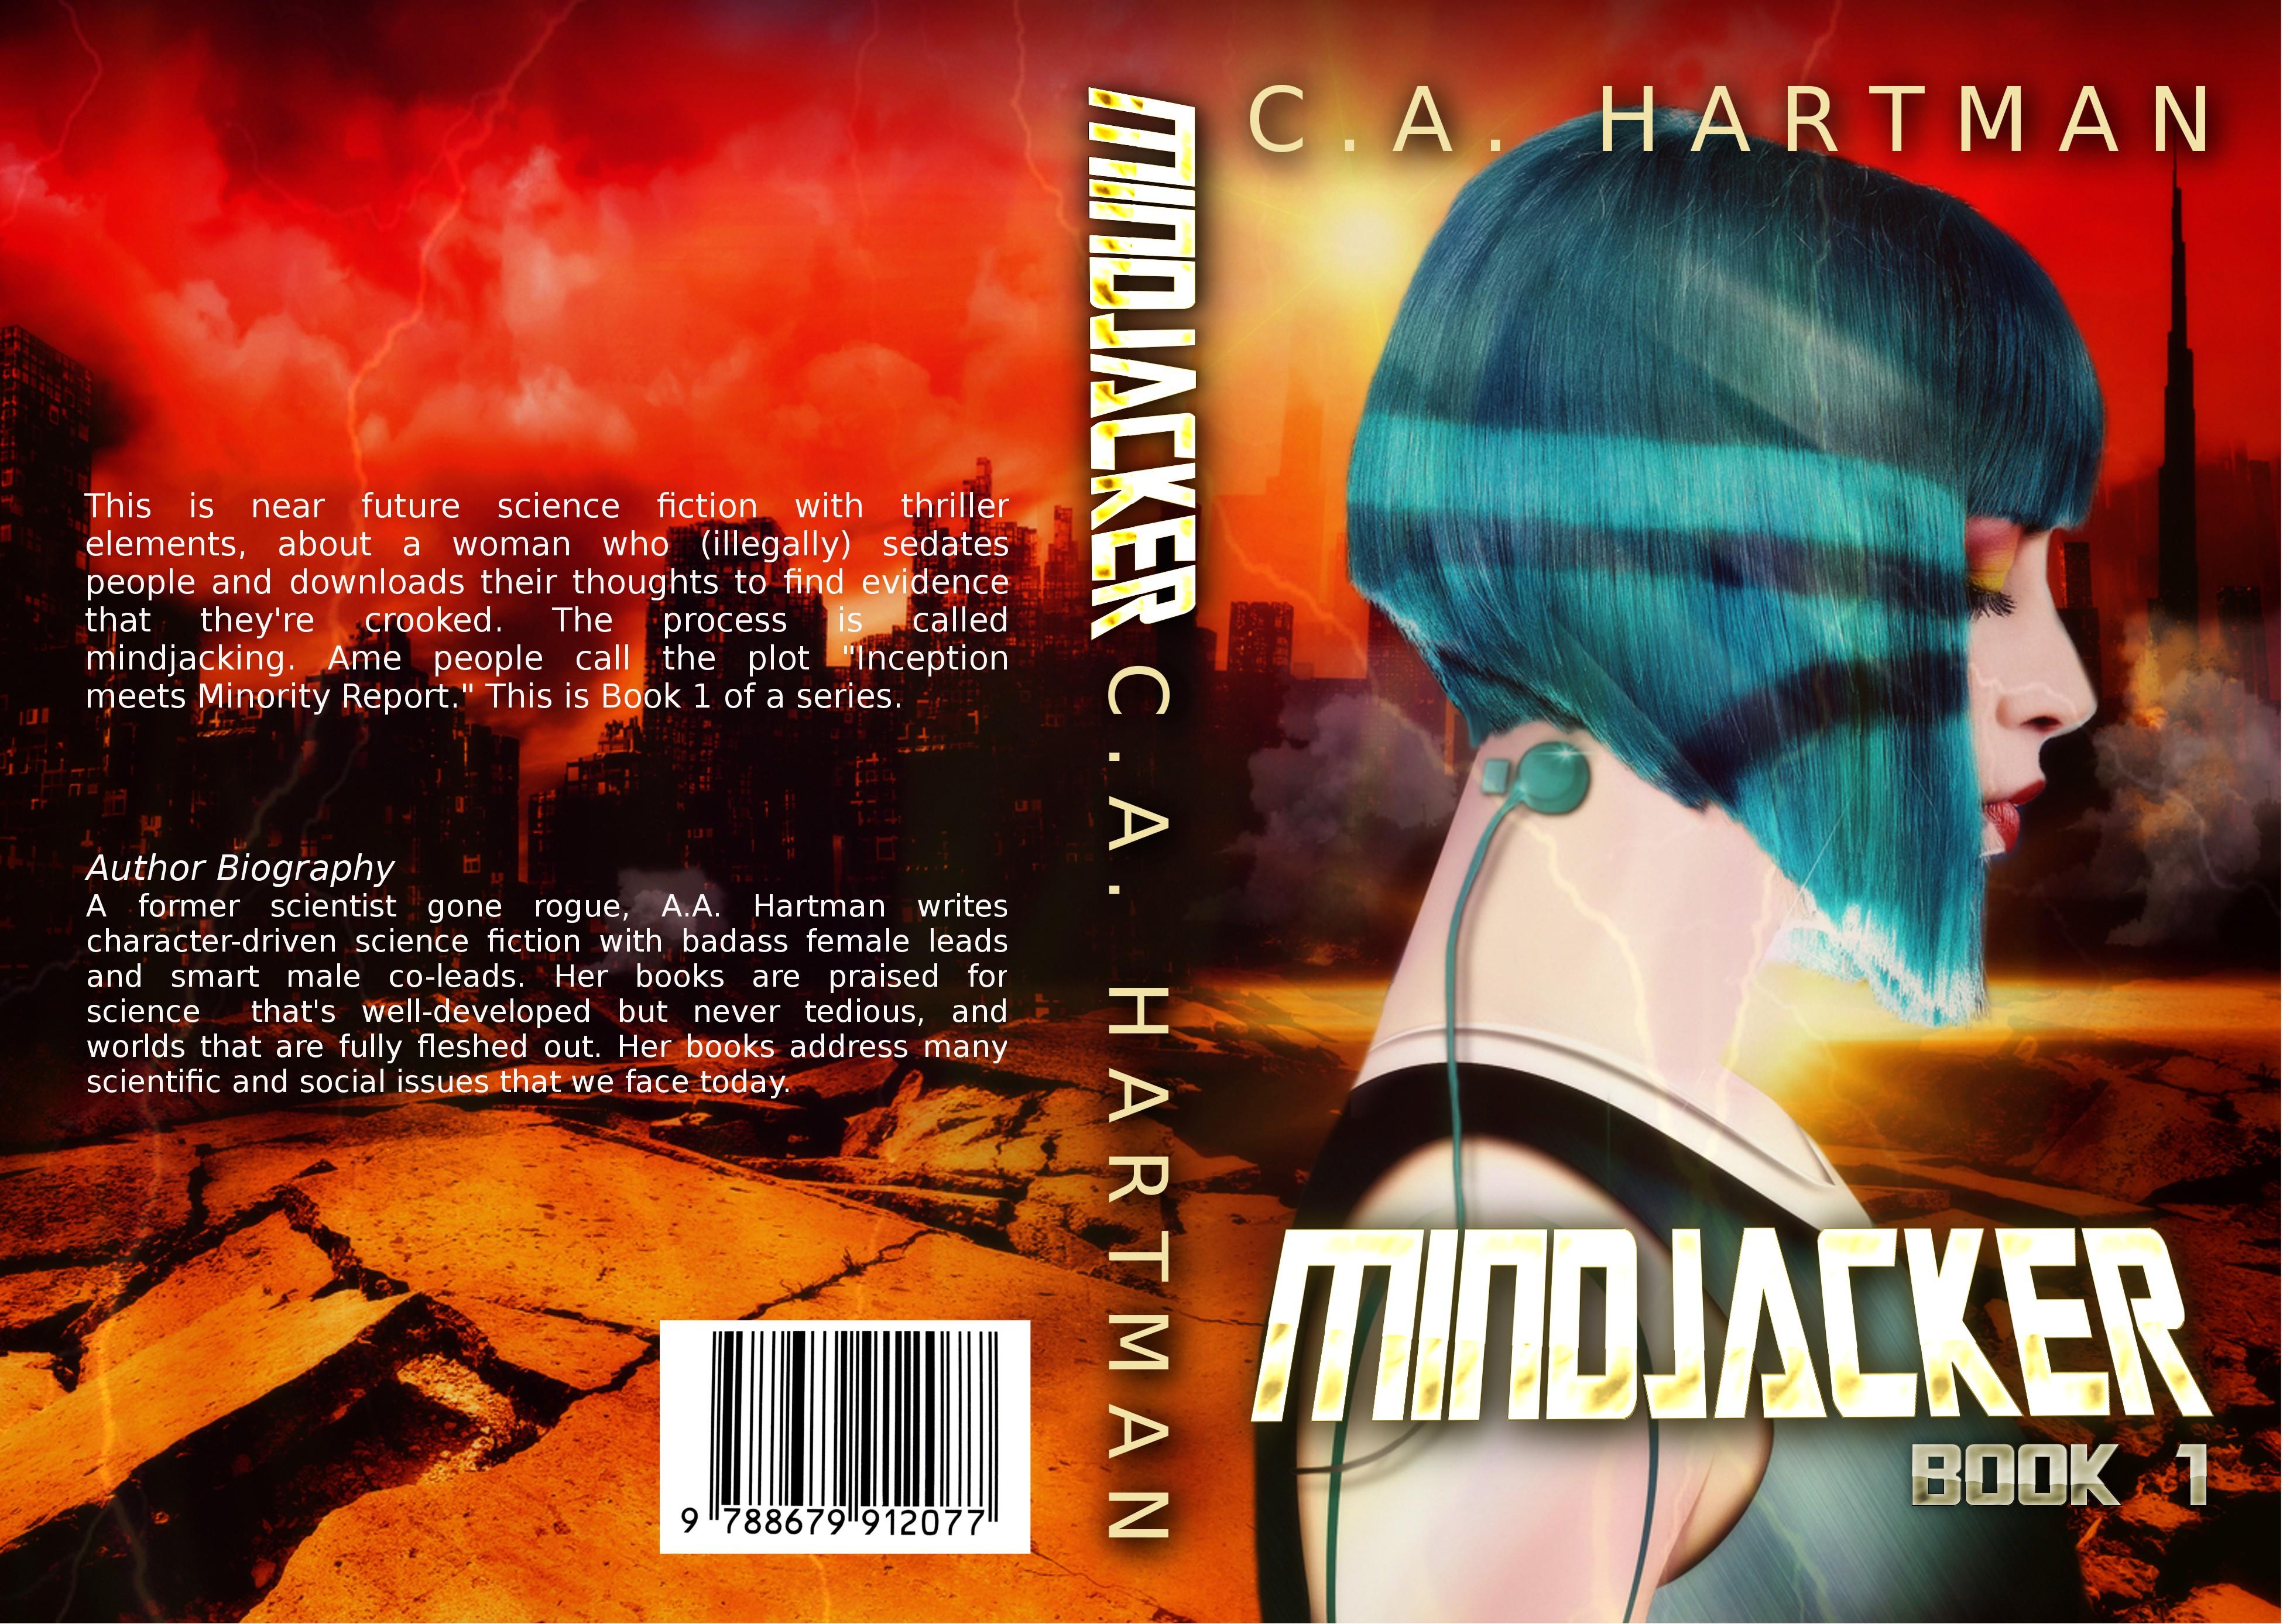 Badass book cover for Mindjacker sci-fi series.